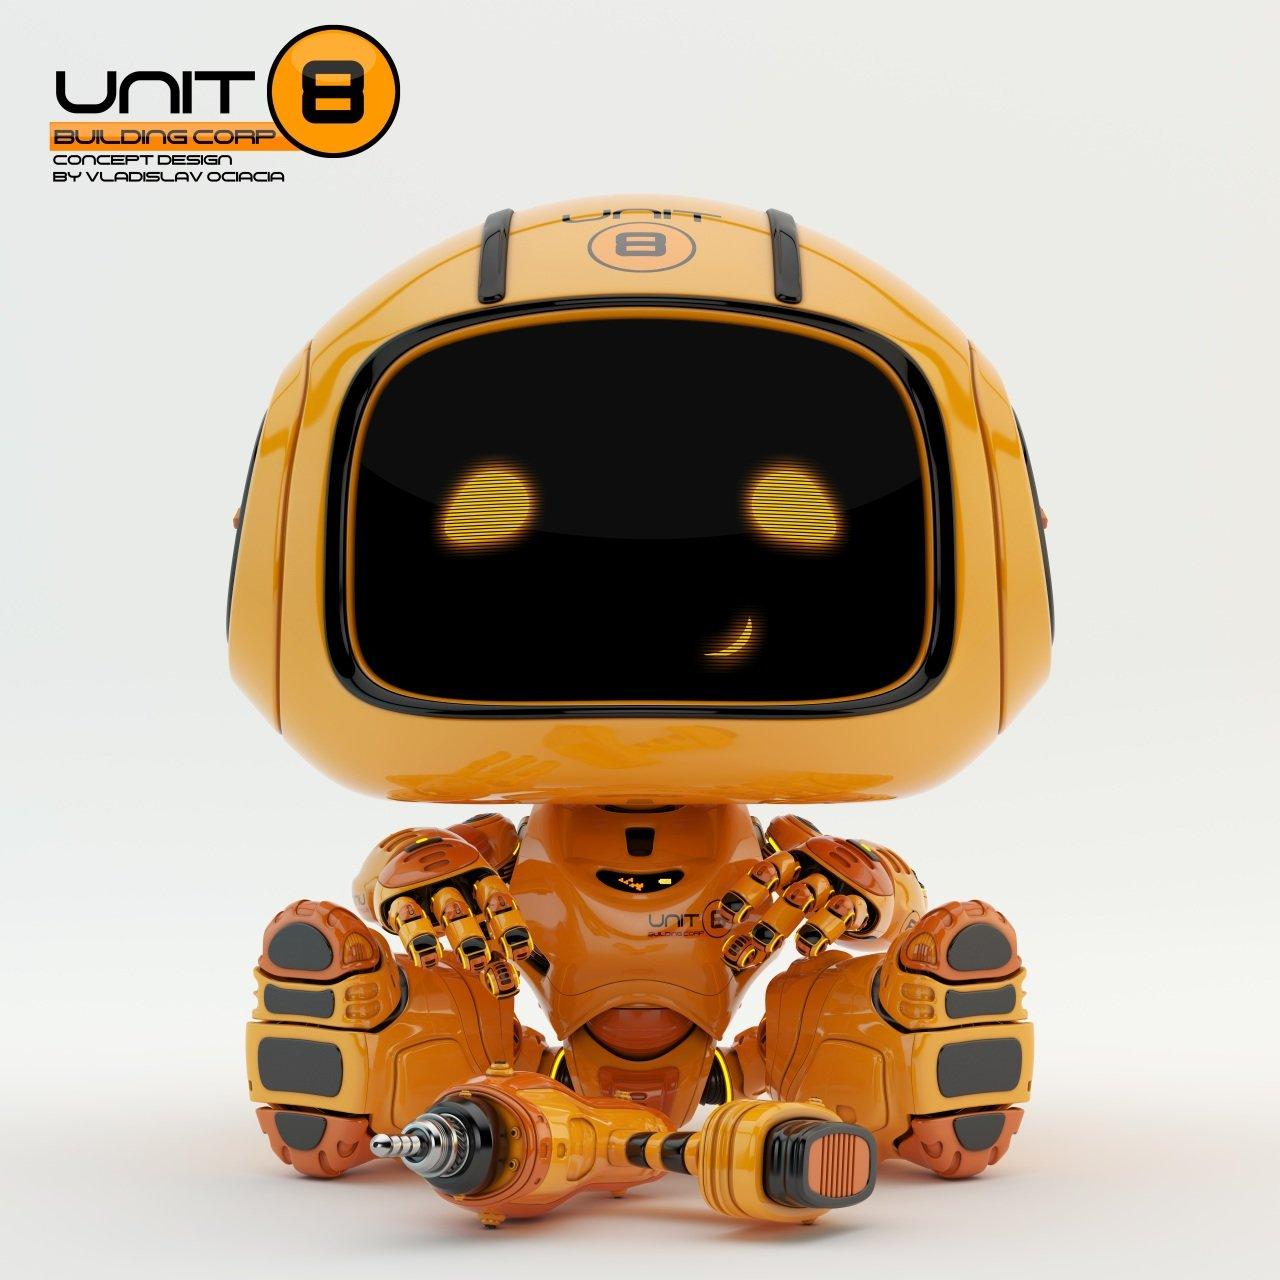 Vladislav ociacia team robot 7